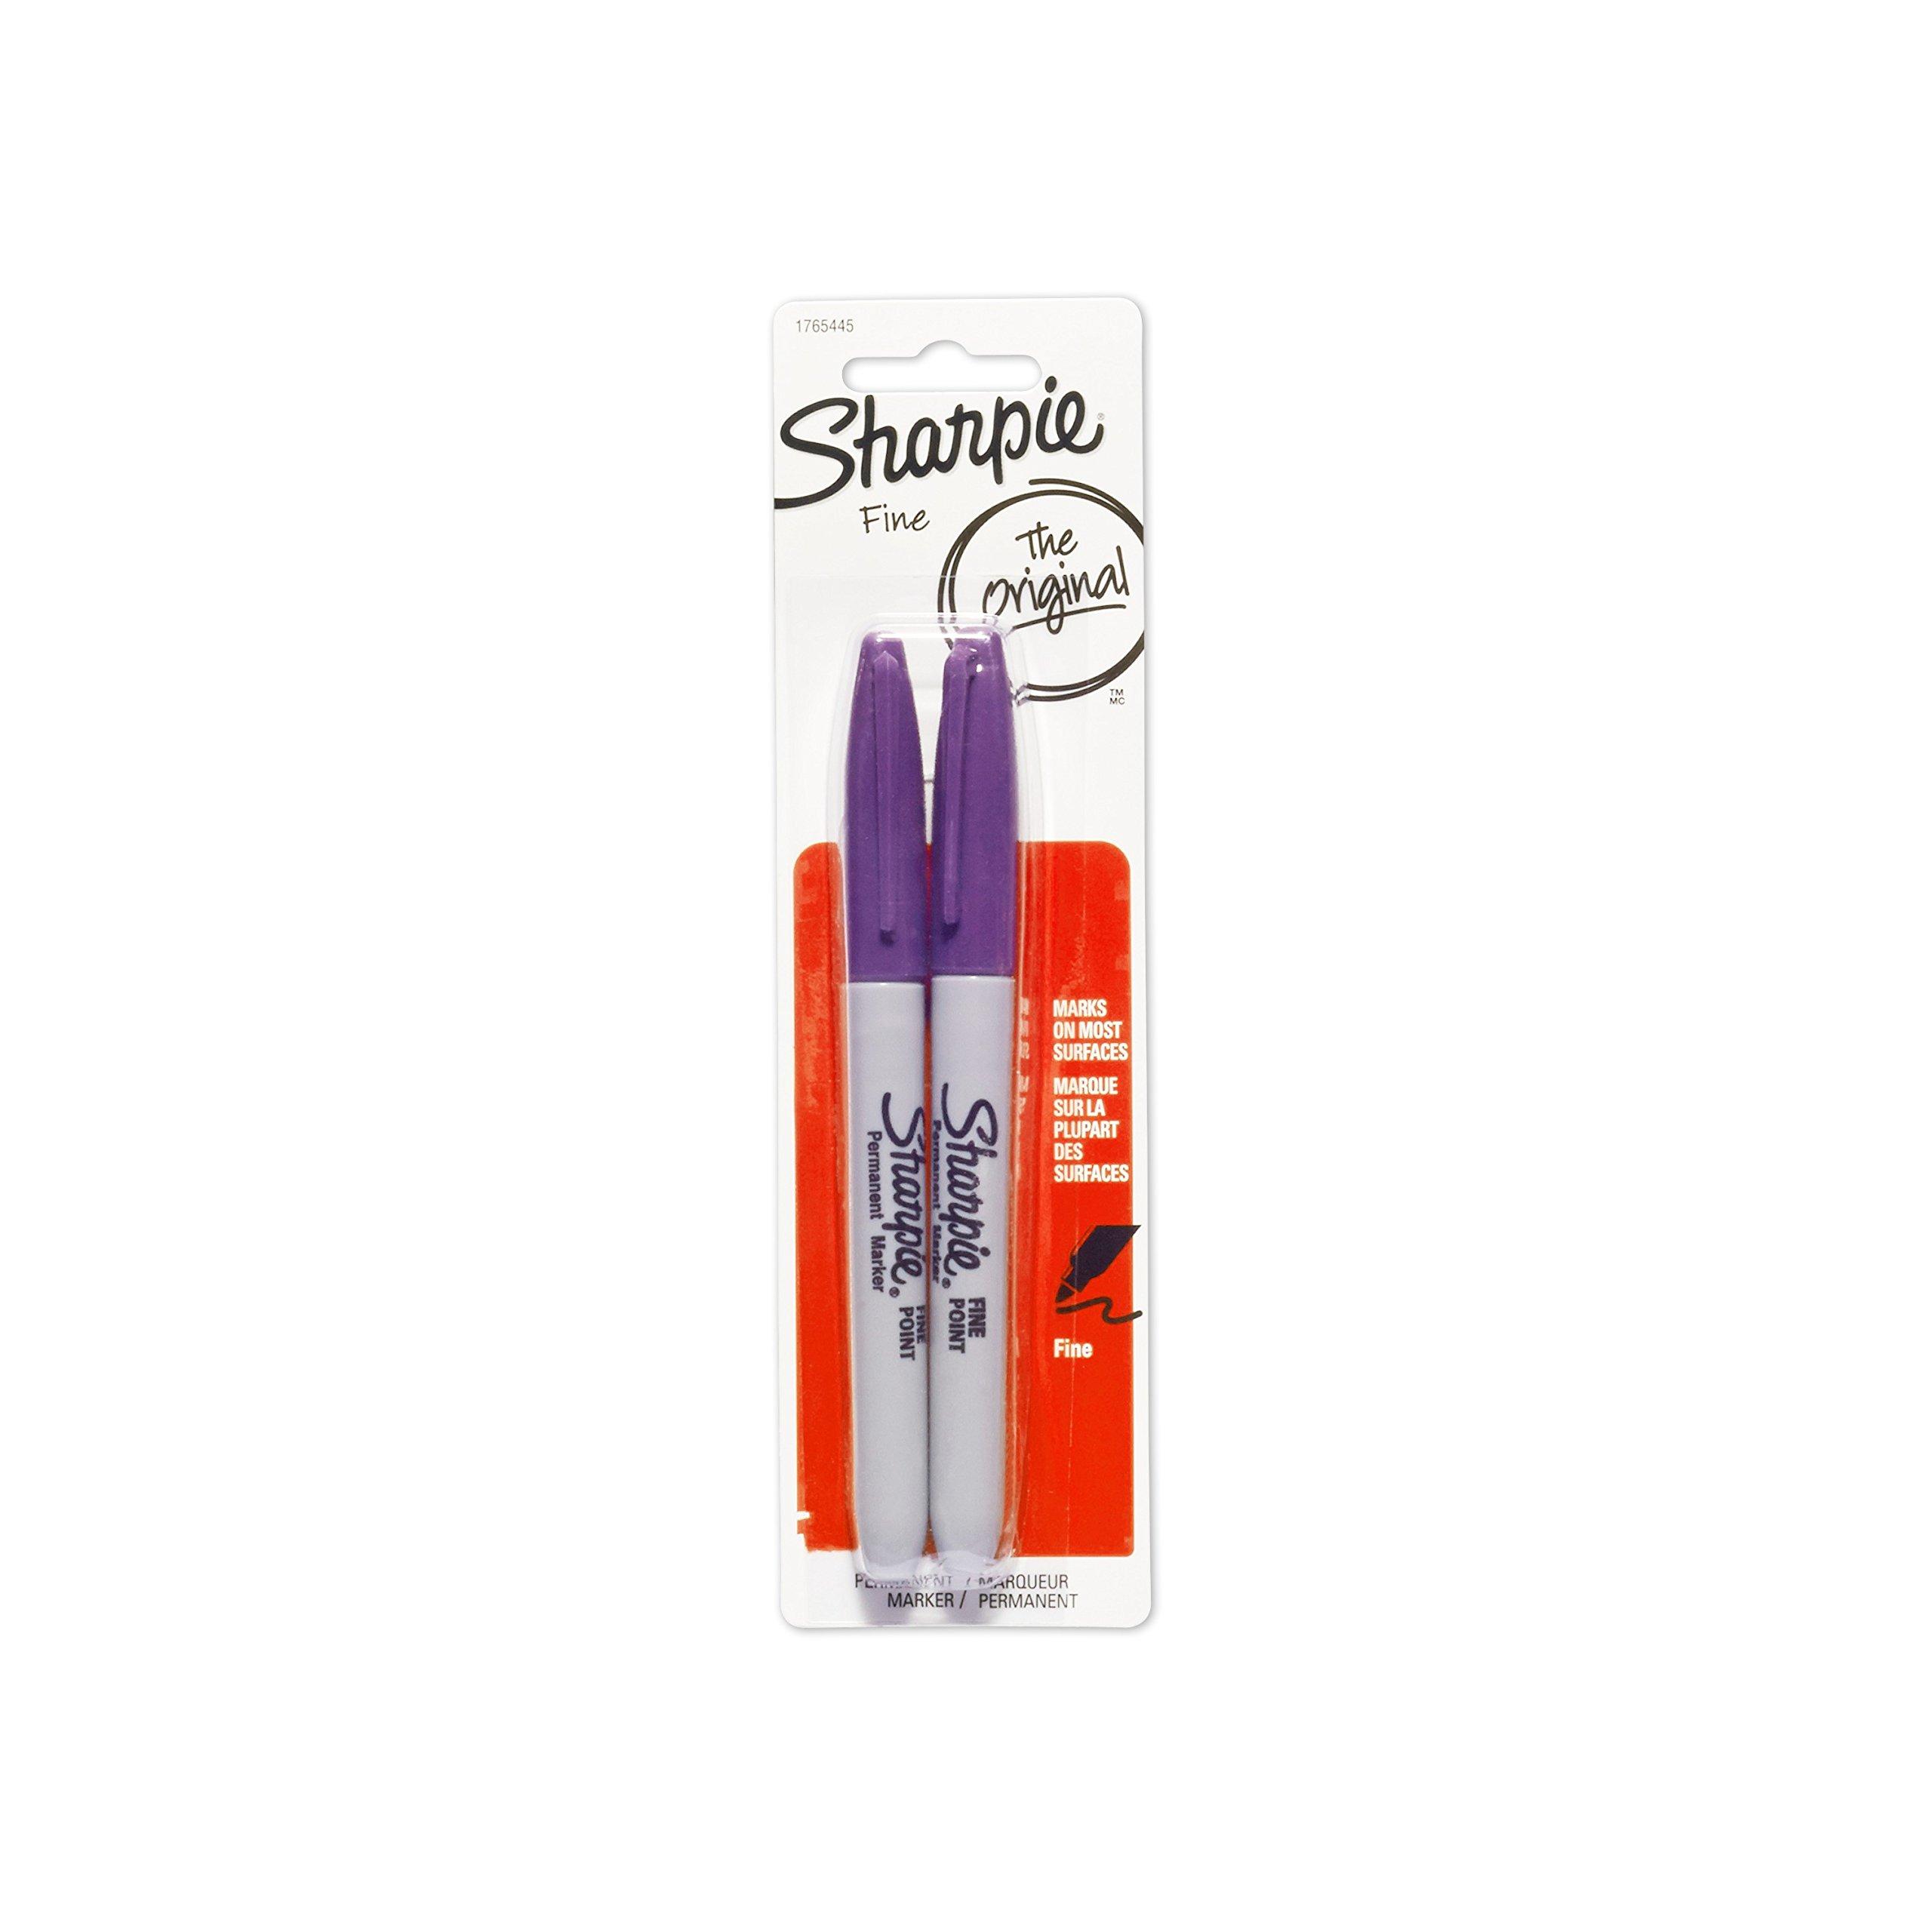 Sharpie Permanent Markers, Fine Point, Purple, 2-Pack (1765445)